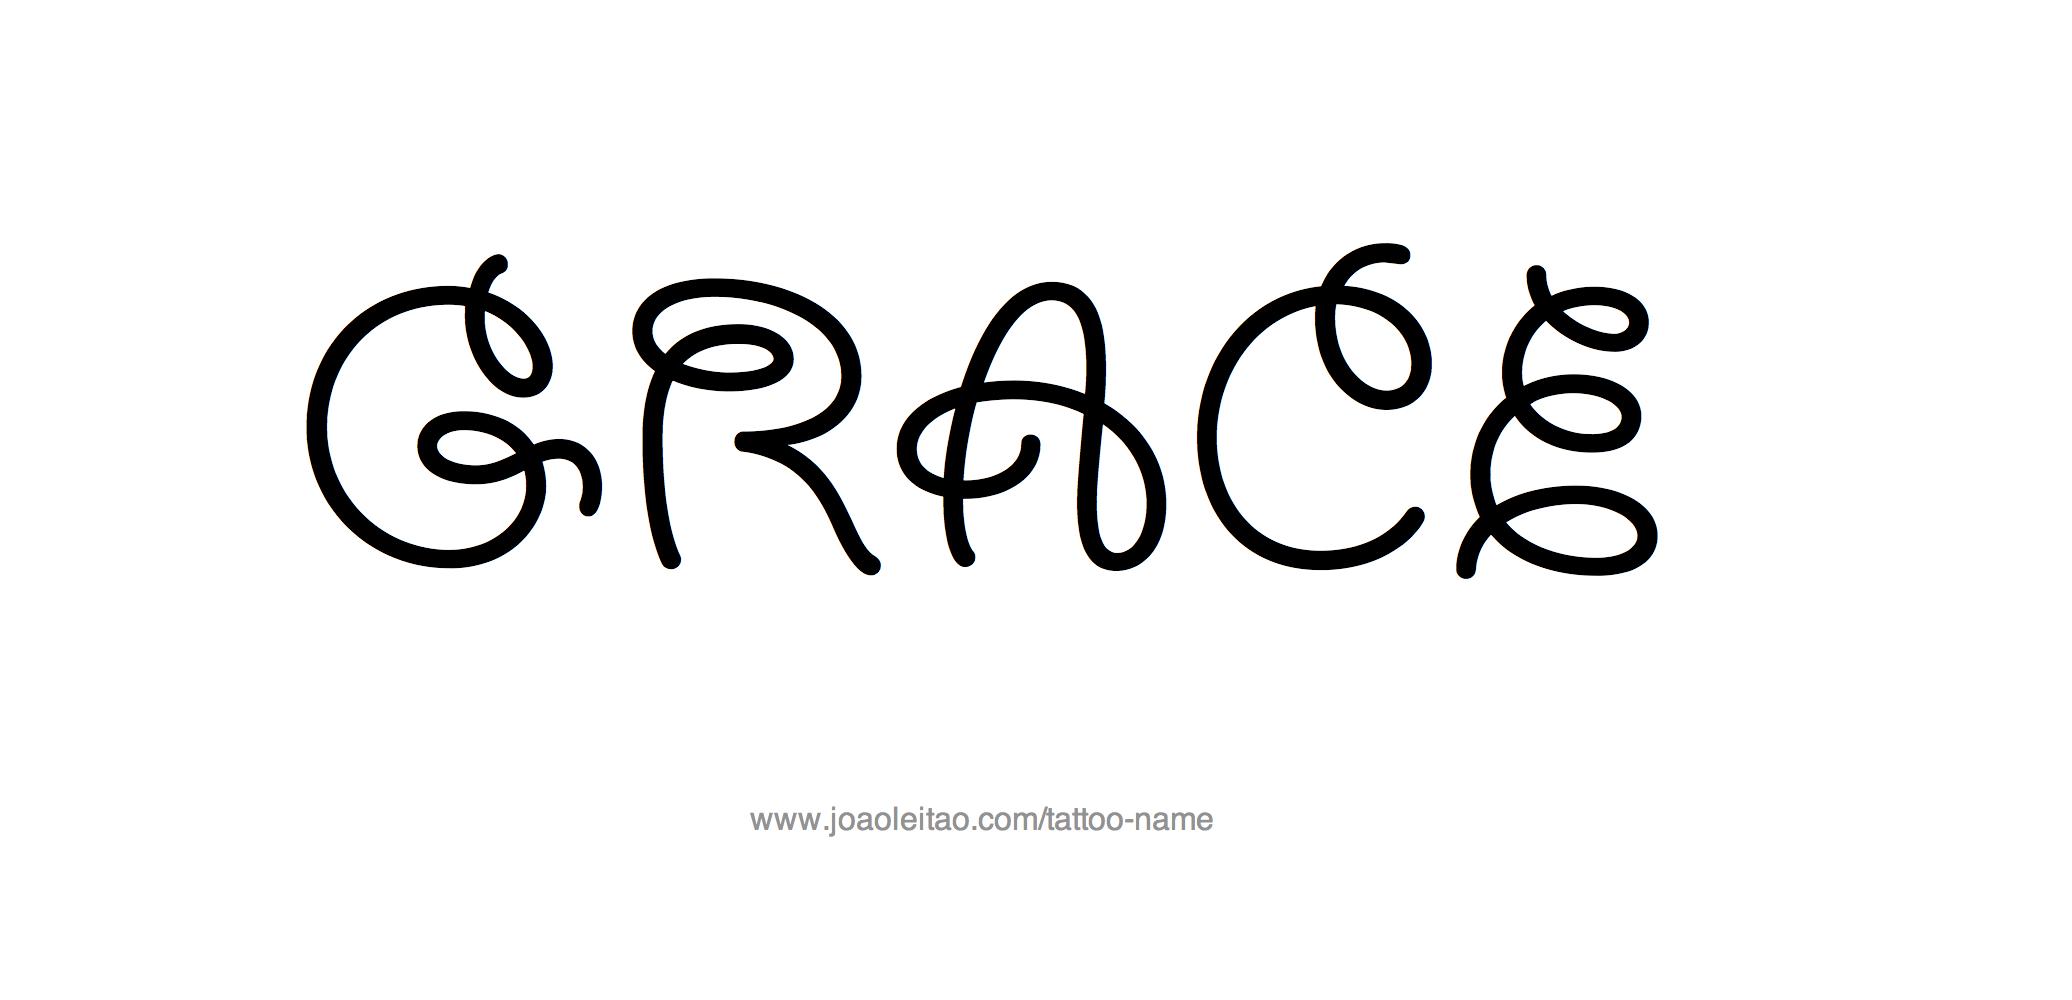 grace name tattoo designs. Black Bedroom Furniture Sets. Home Design Ideas